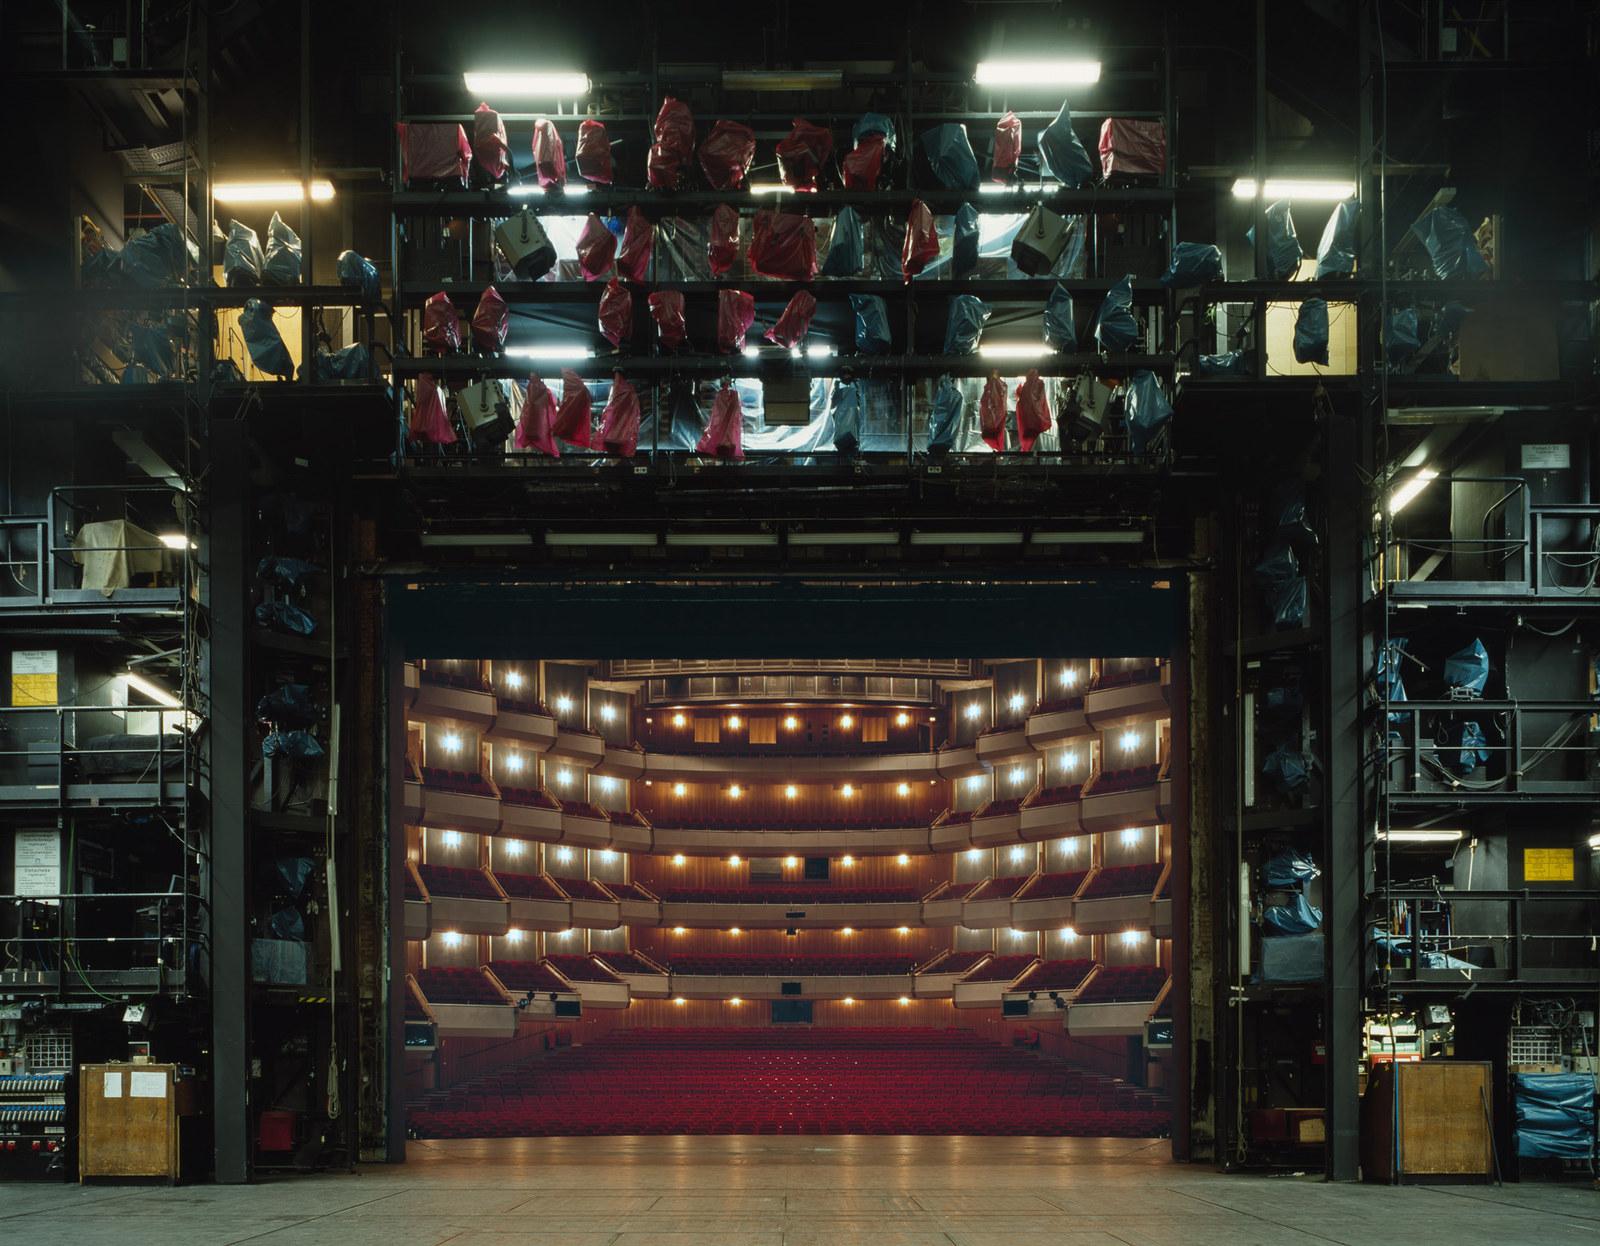 Государственная опера Гамбурга (Hamburg State Opera)